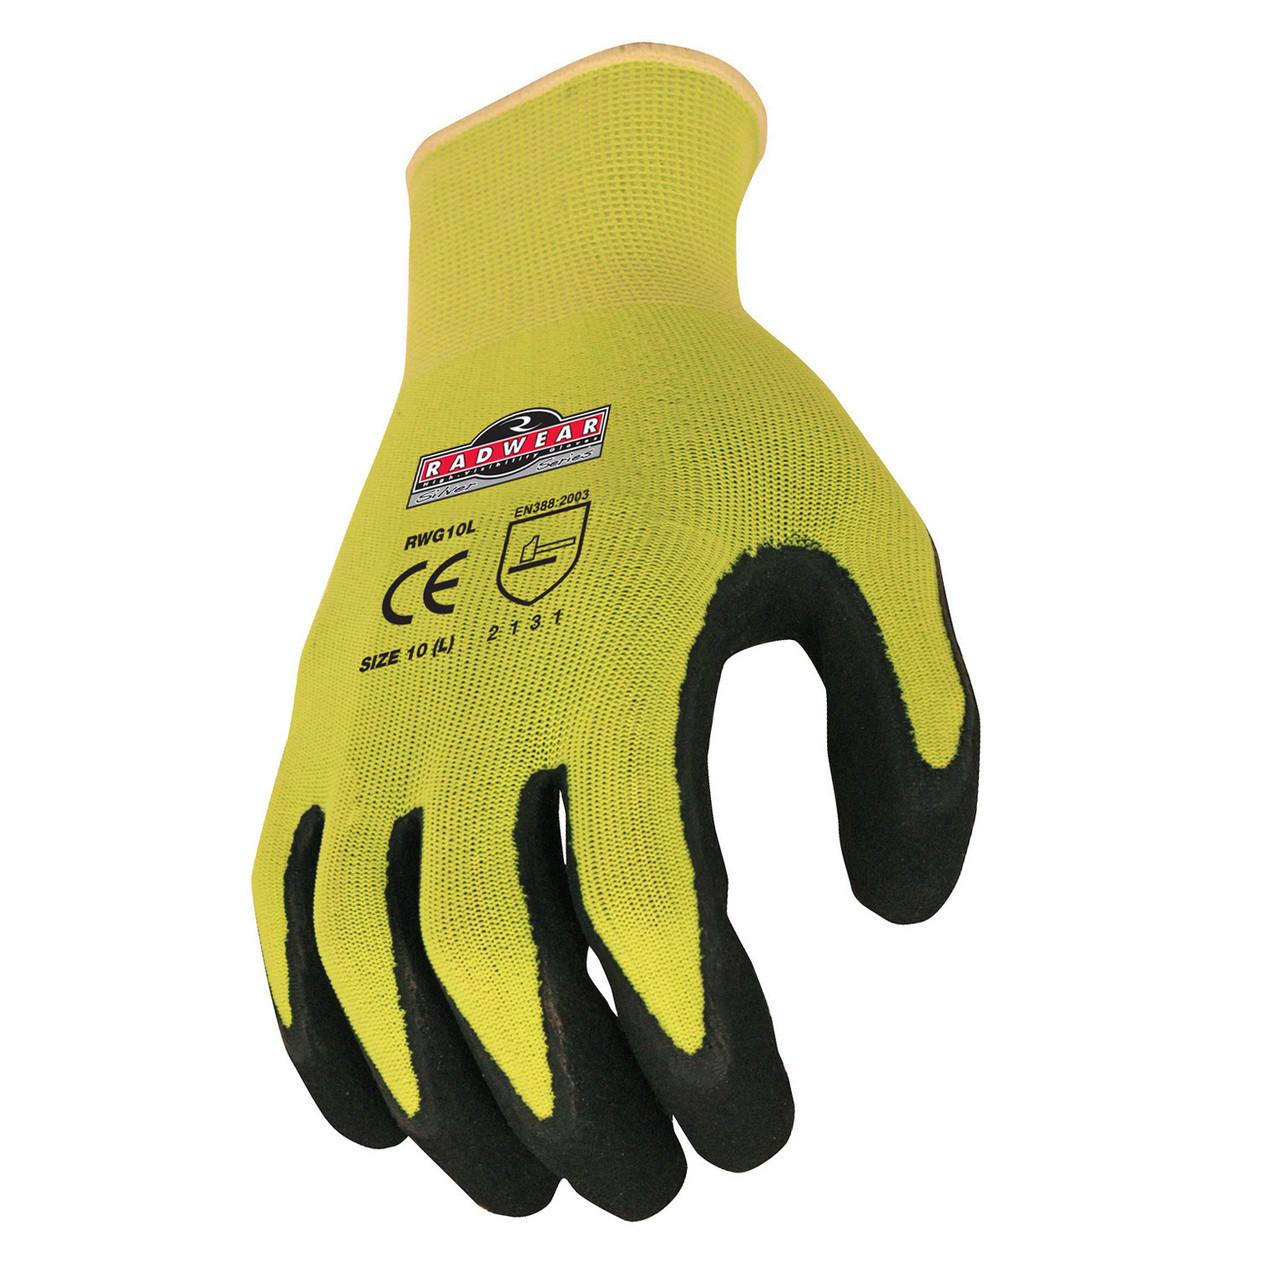 Radwear Silver Series Hi-Viz Knit Dip Glove